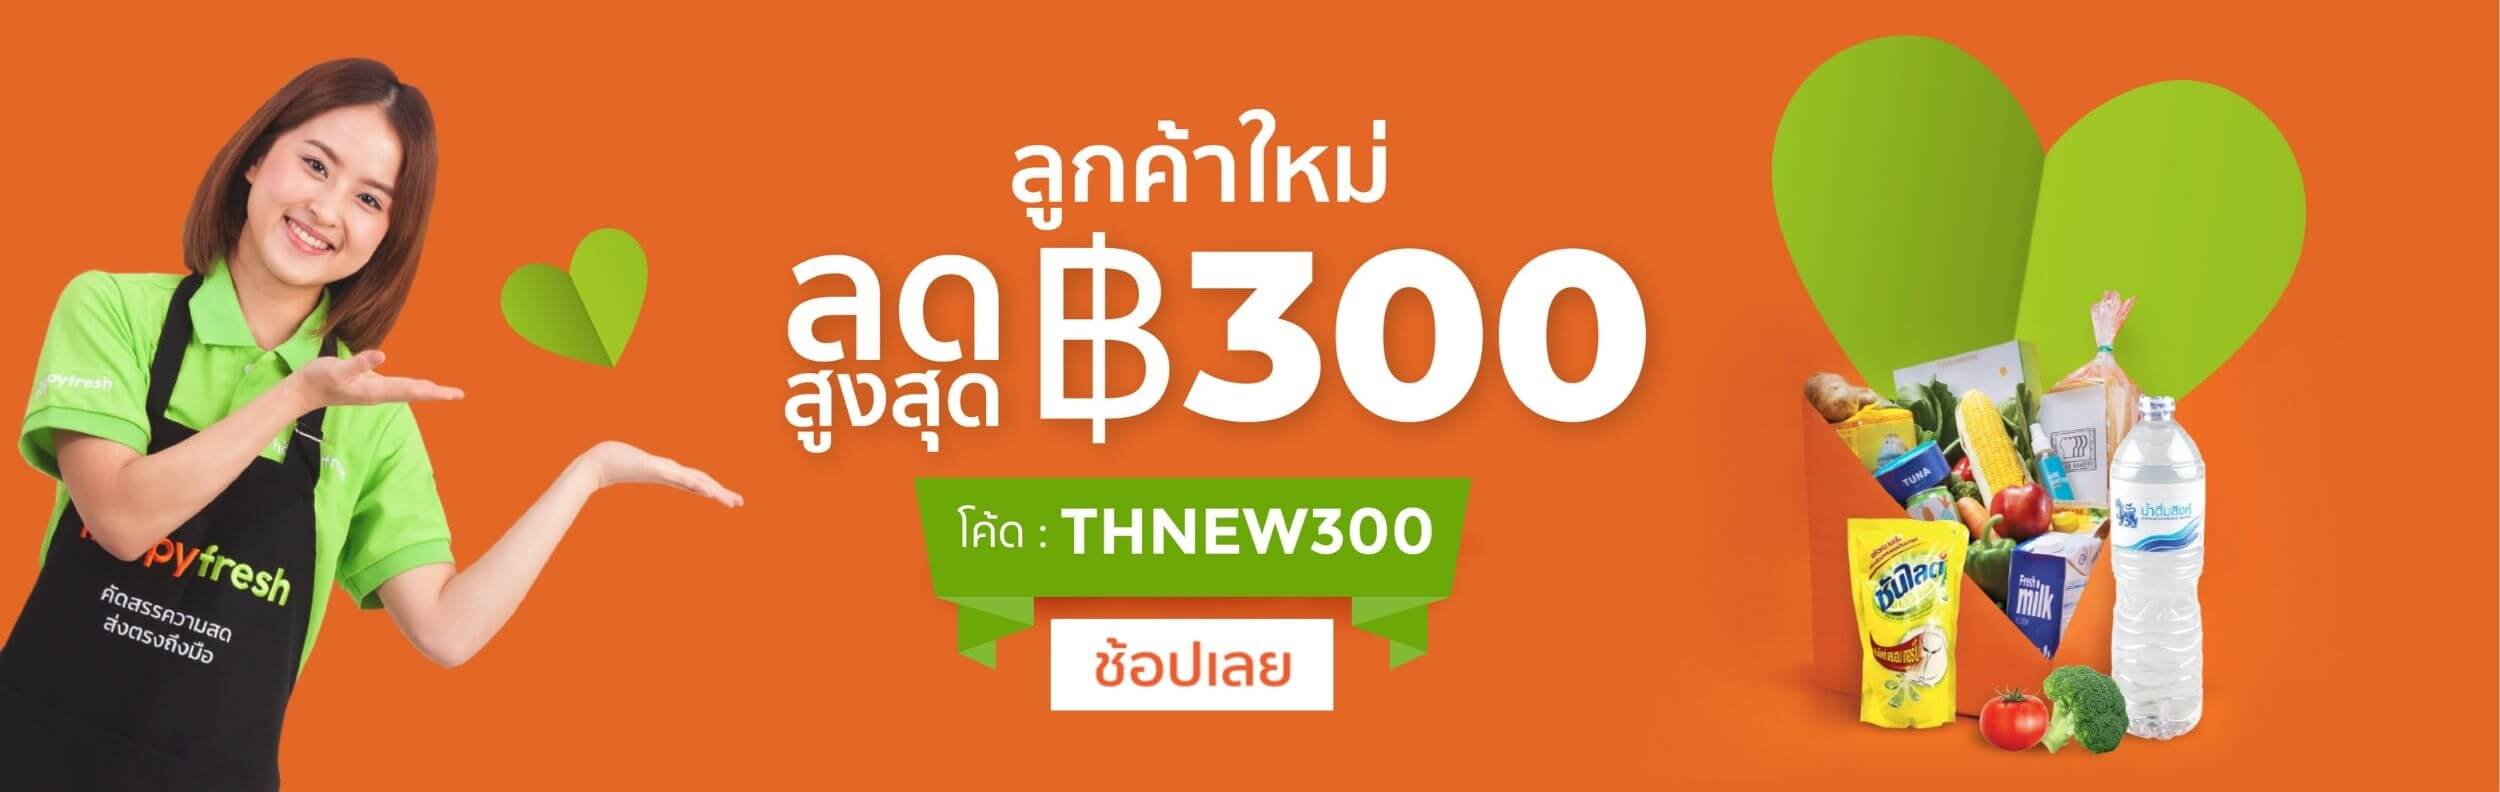 Header Banner ลูกค้าใหม่ ลด 300 บาท